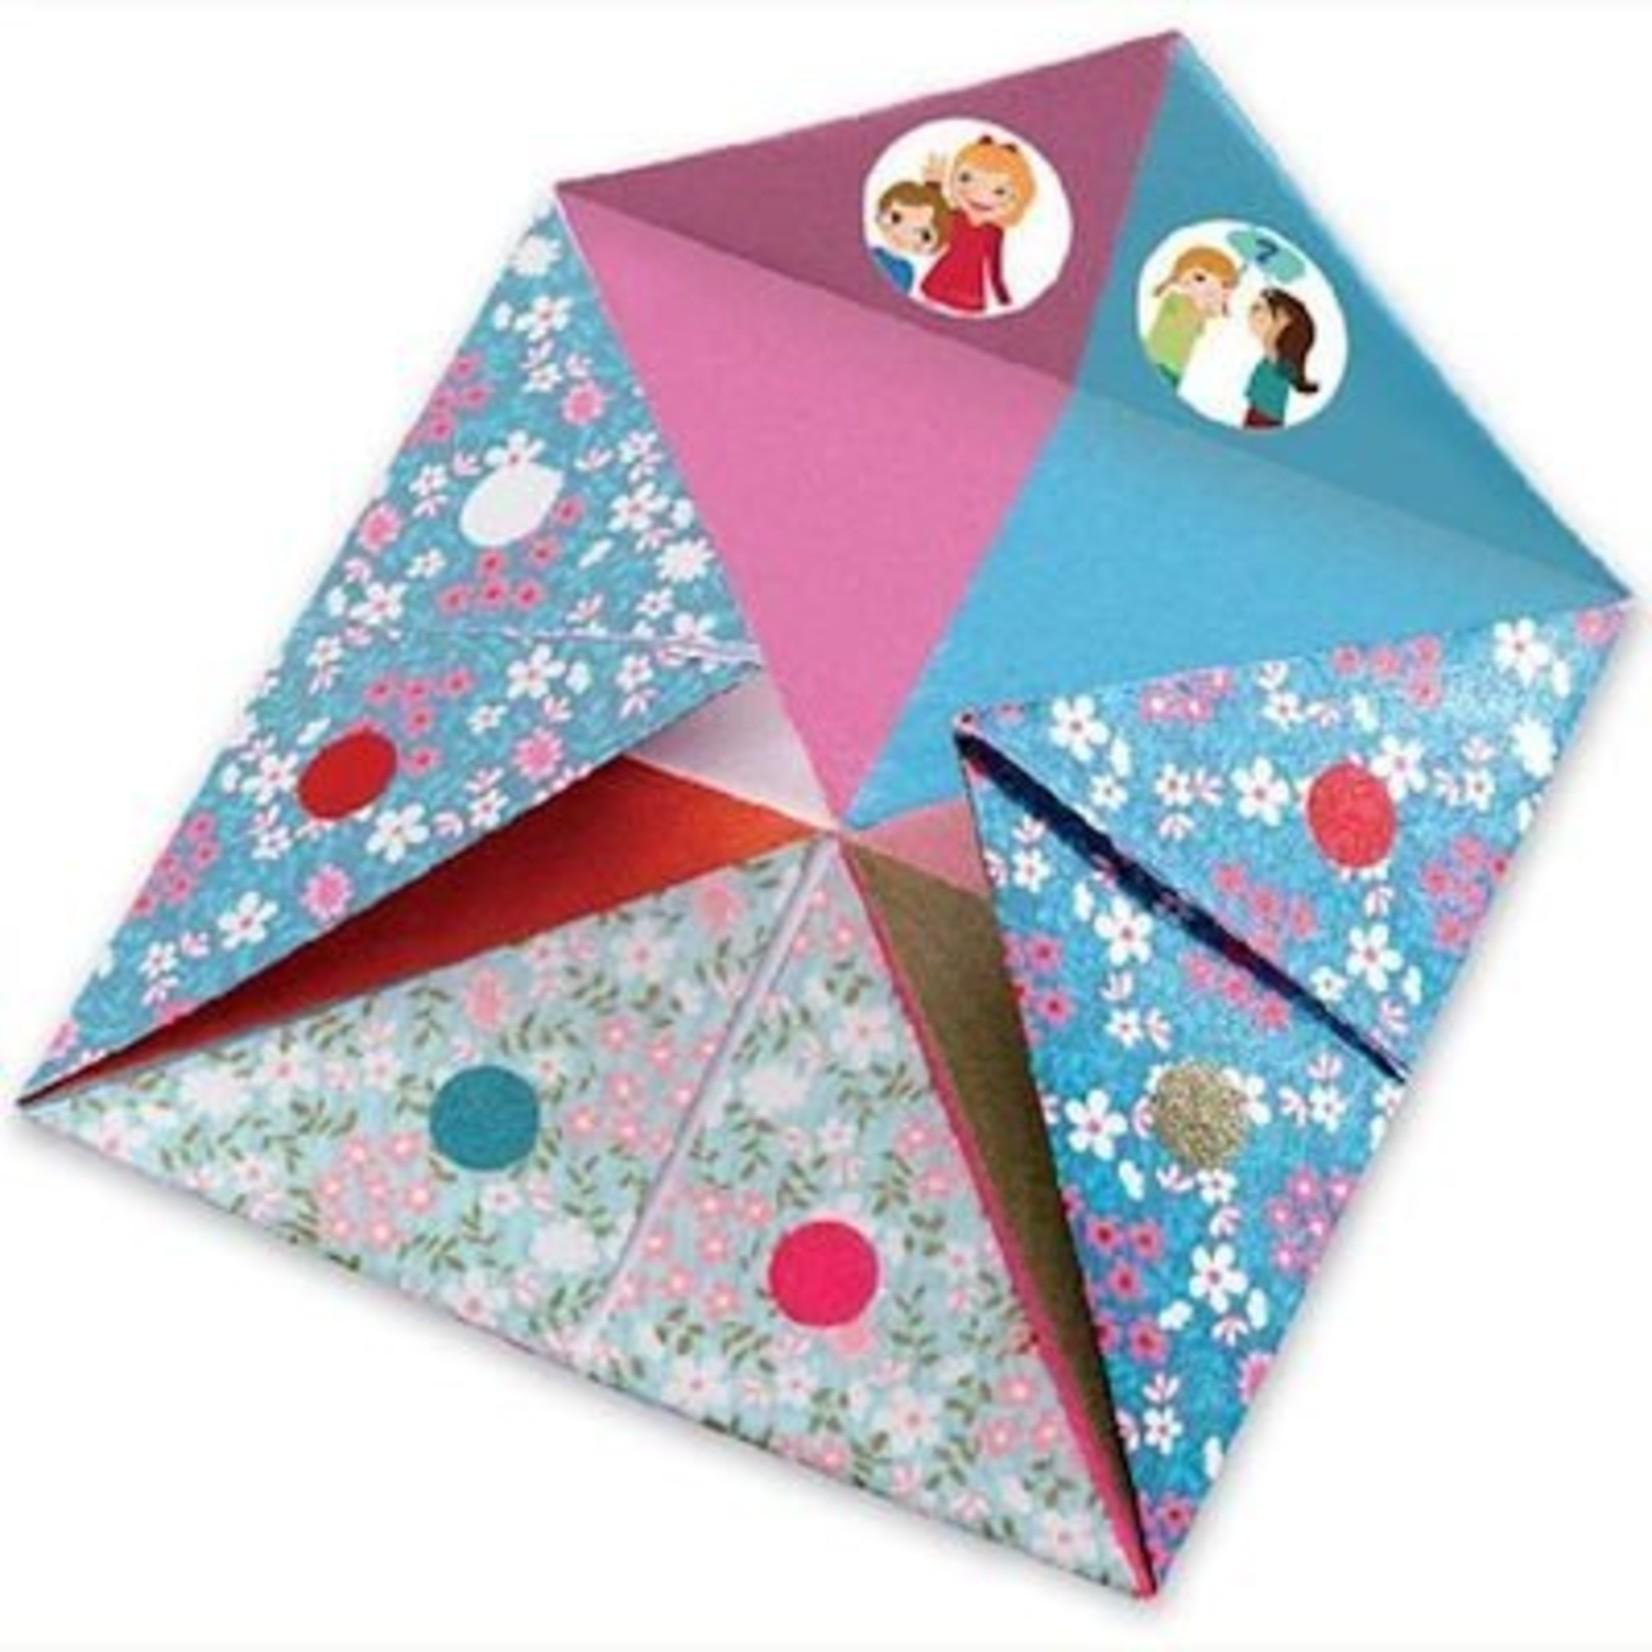 Djeco Knutselset Origami Peper en Zoutvaatje